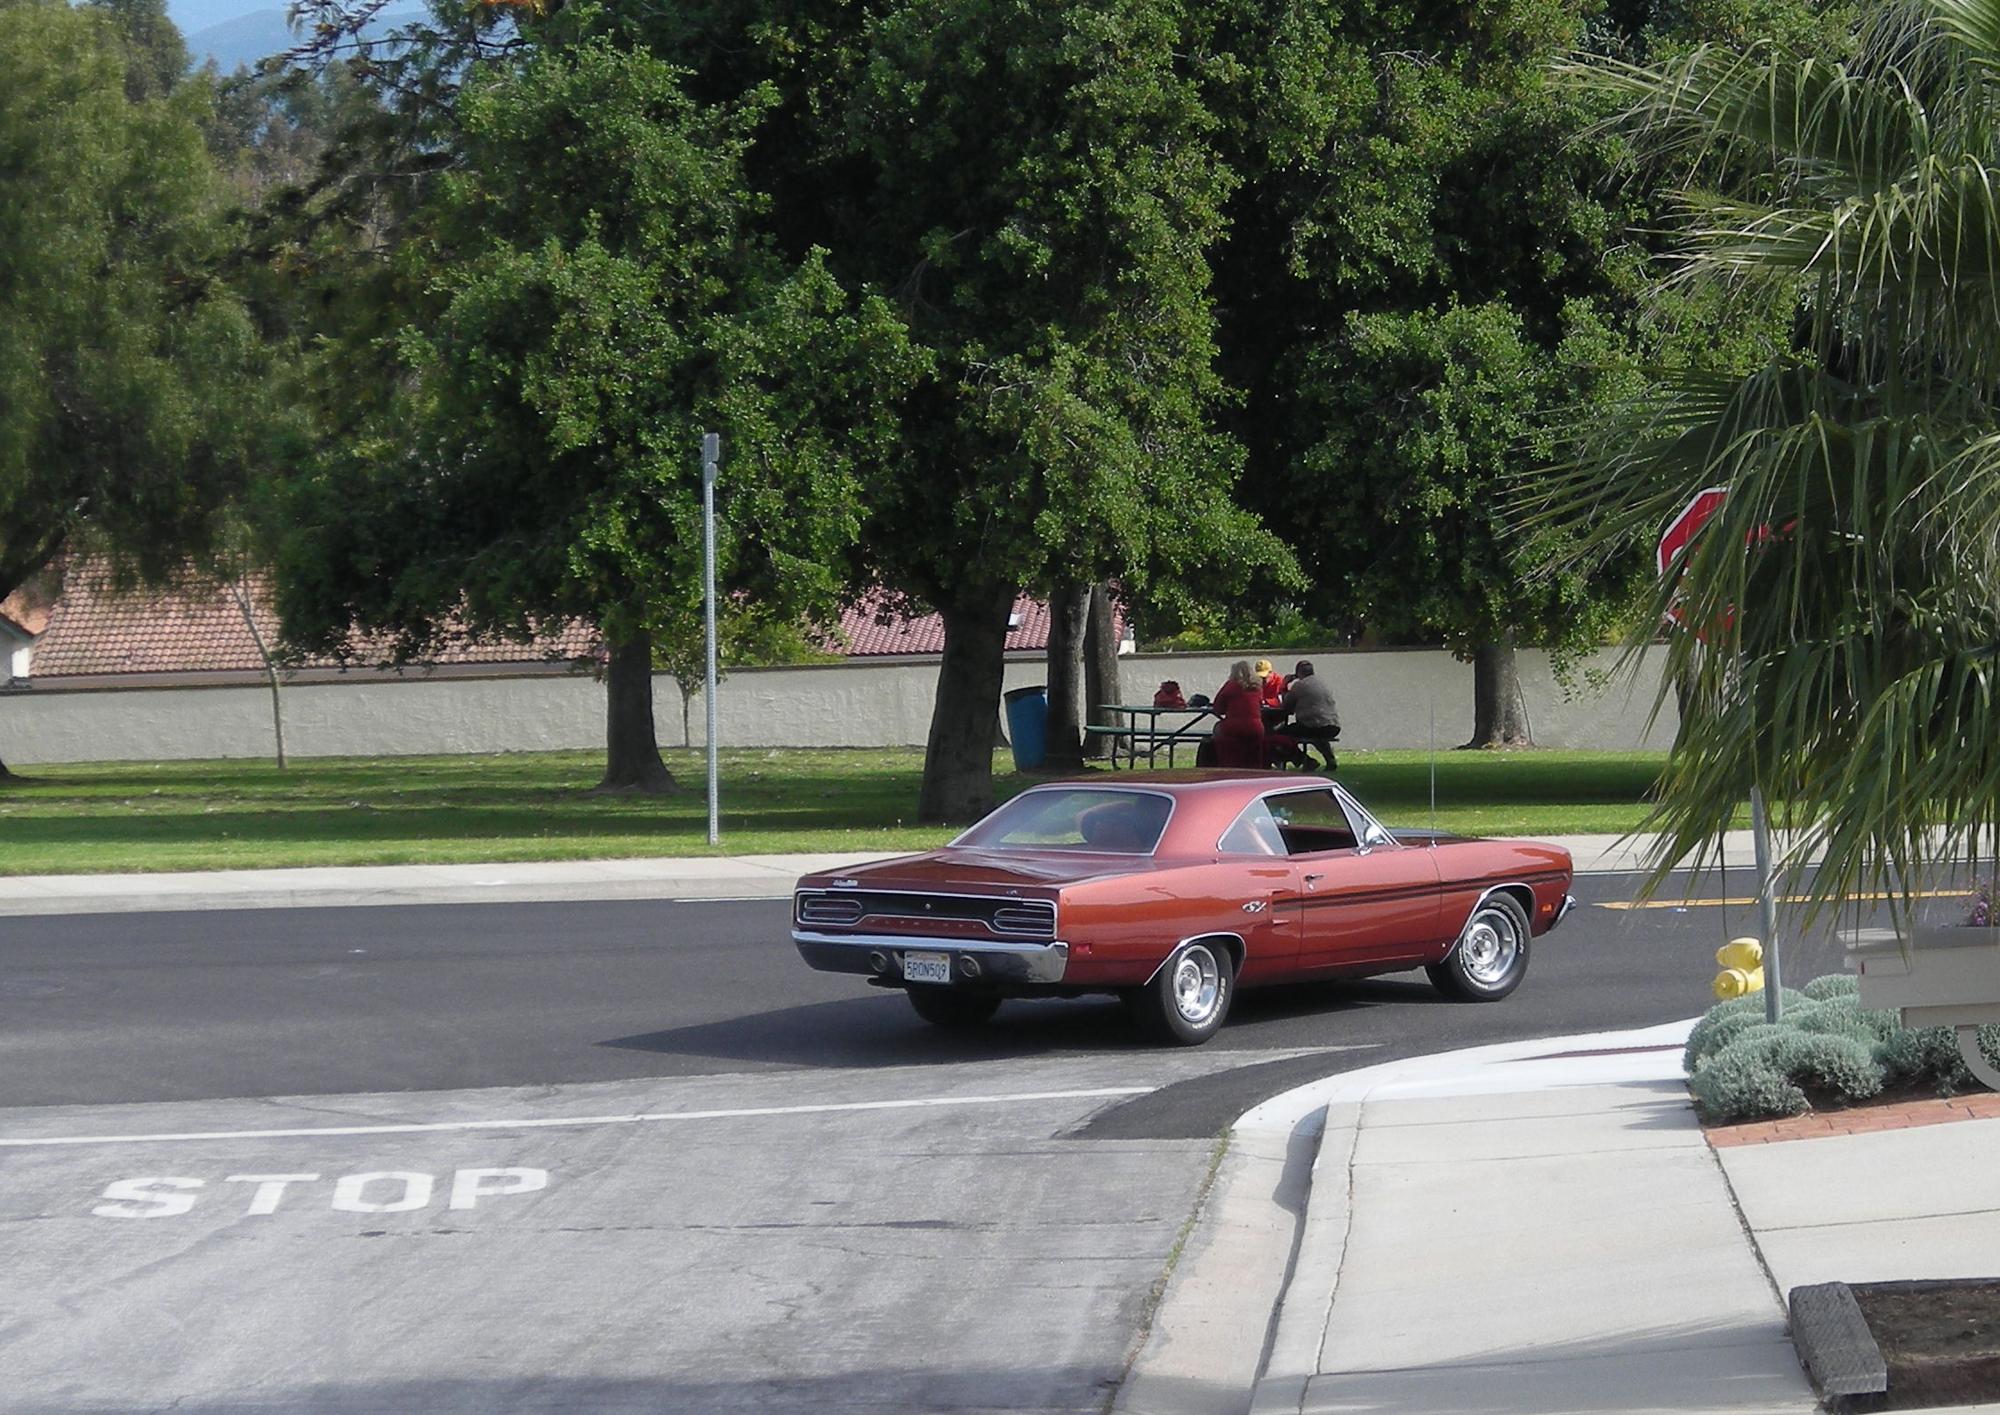 1970 Plymouth GTX Last Shot